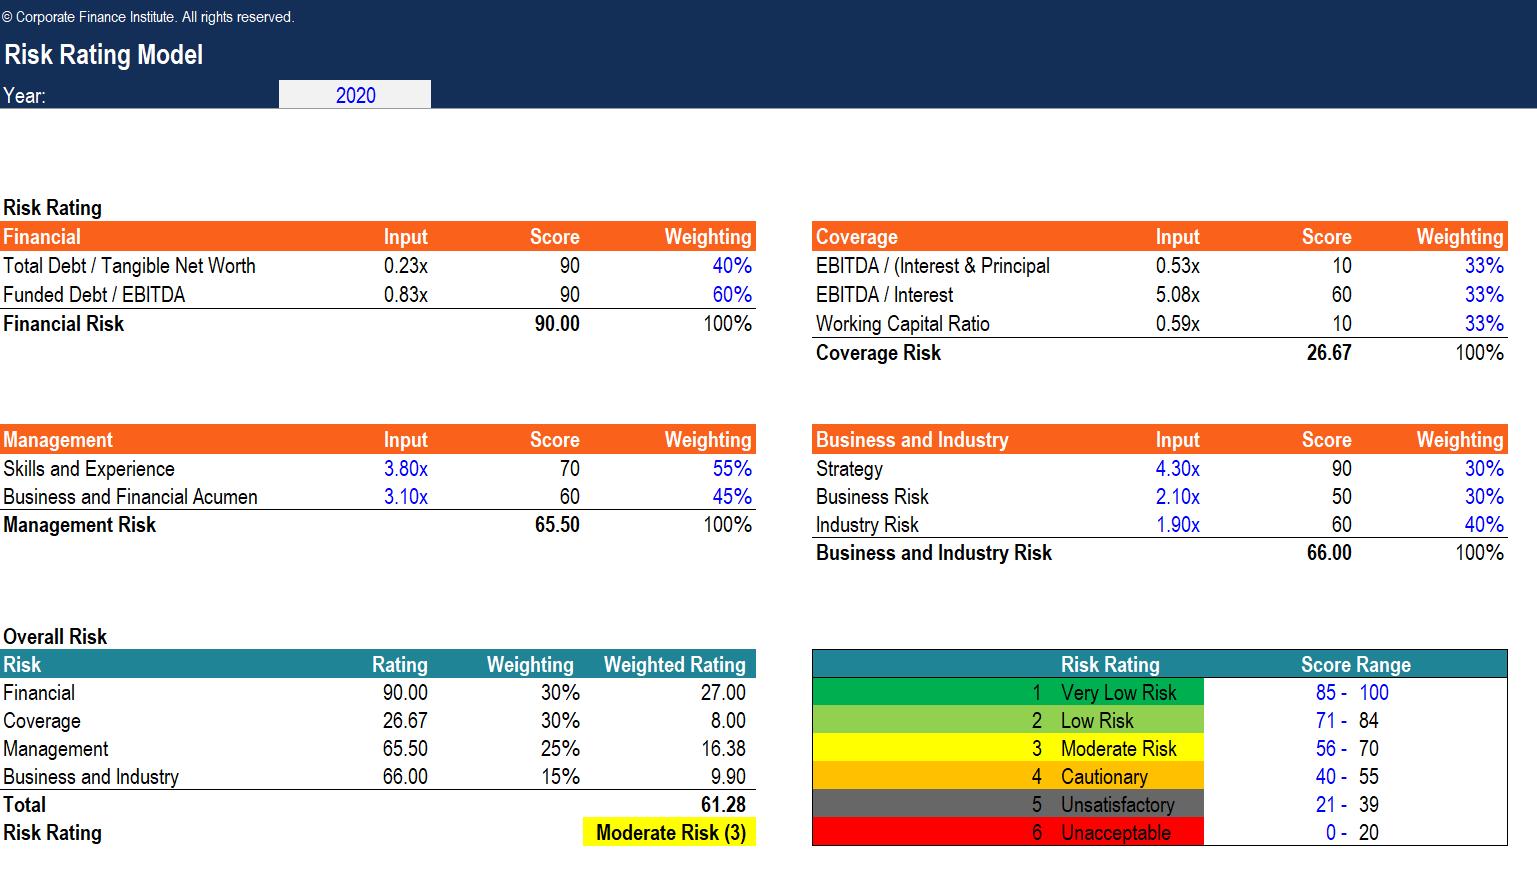 Risk rating model